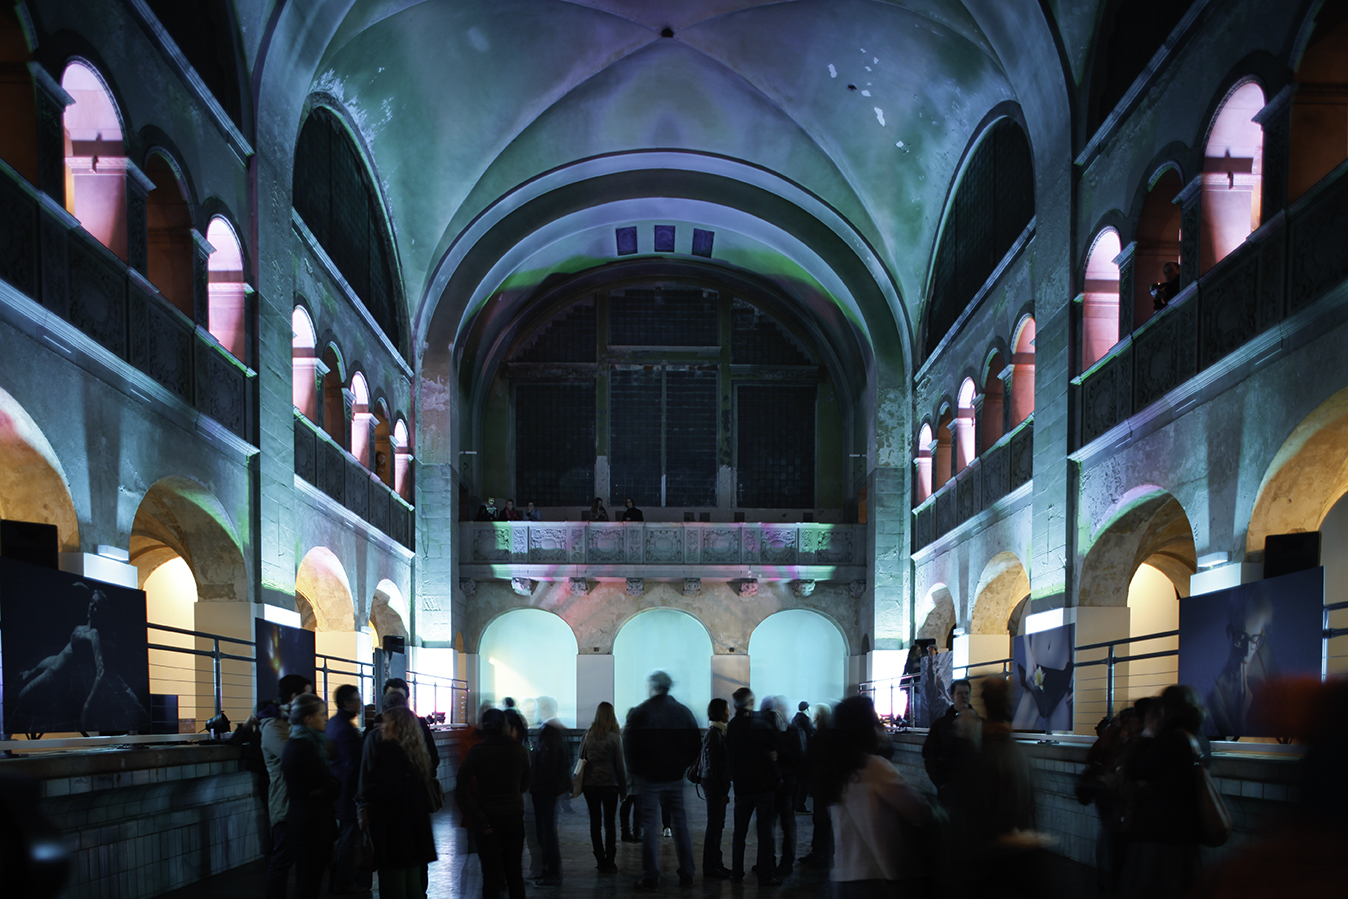 EVERYTHING IS ILLUSION, Keimeyer, performance art, installation art